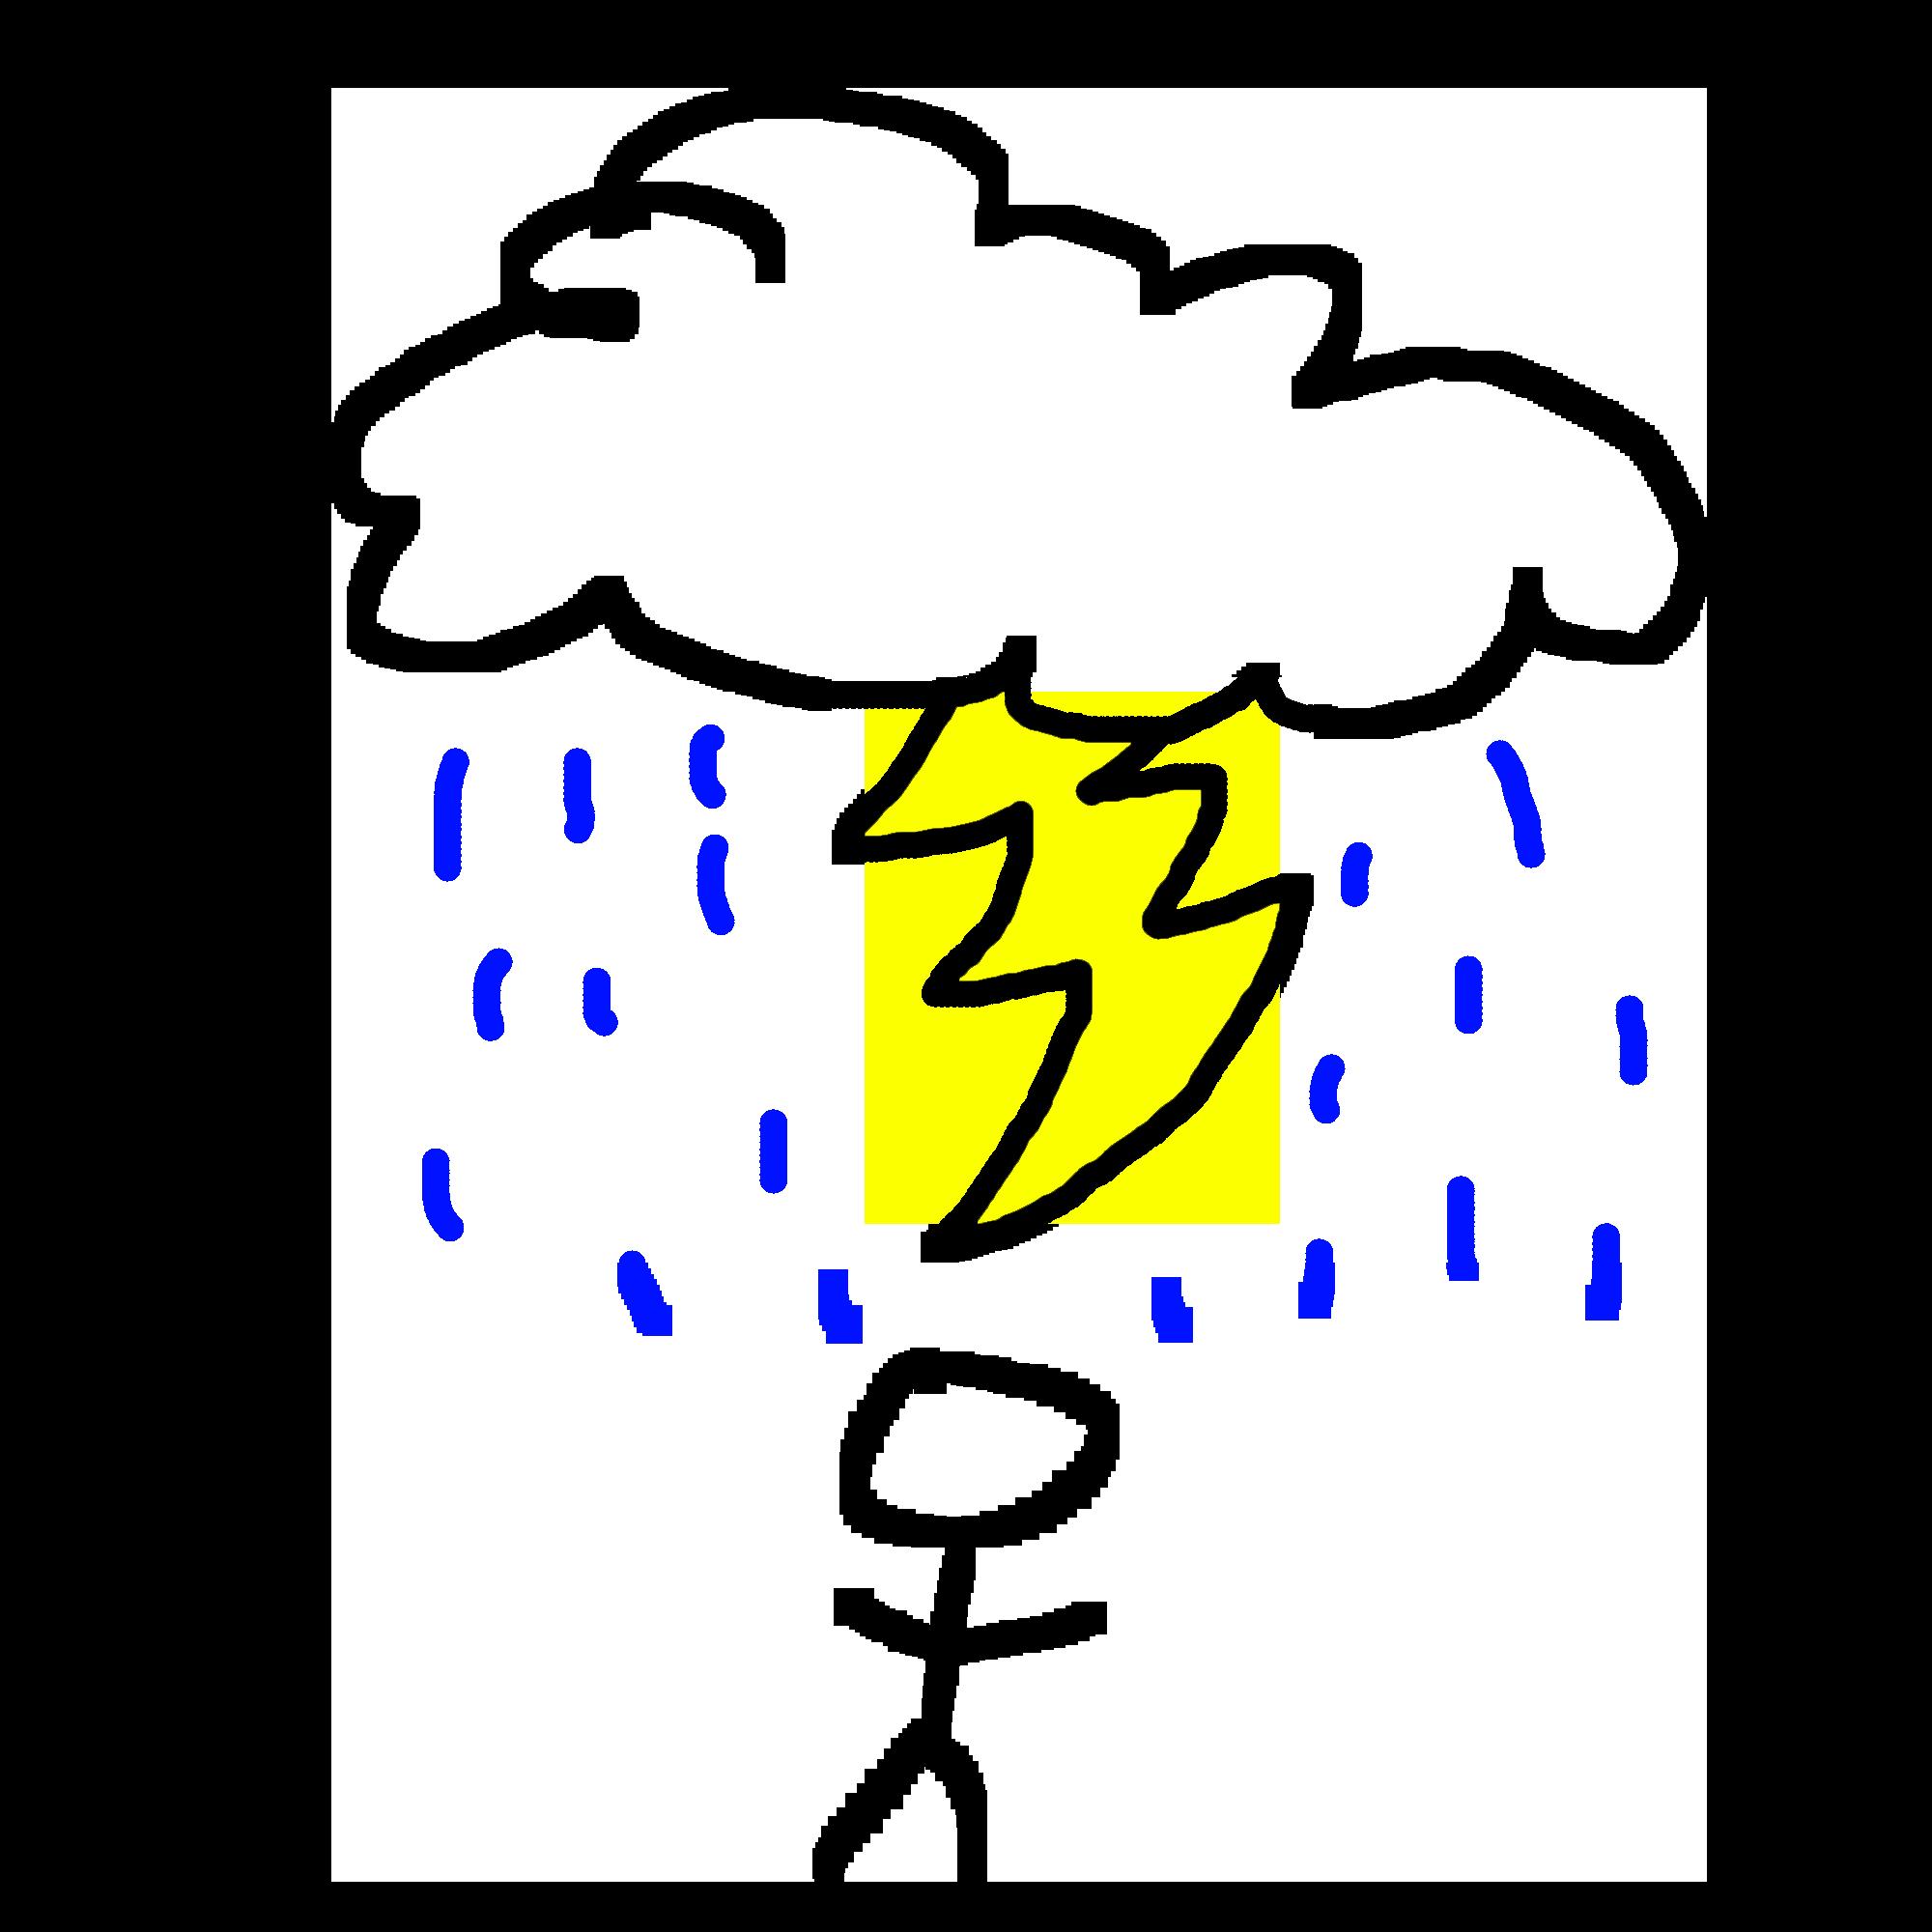 Challenge #02 - Worst Weather